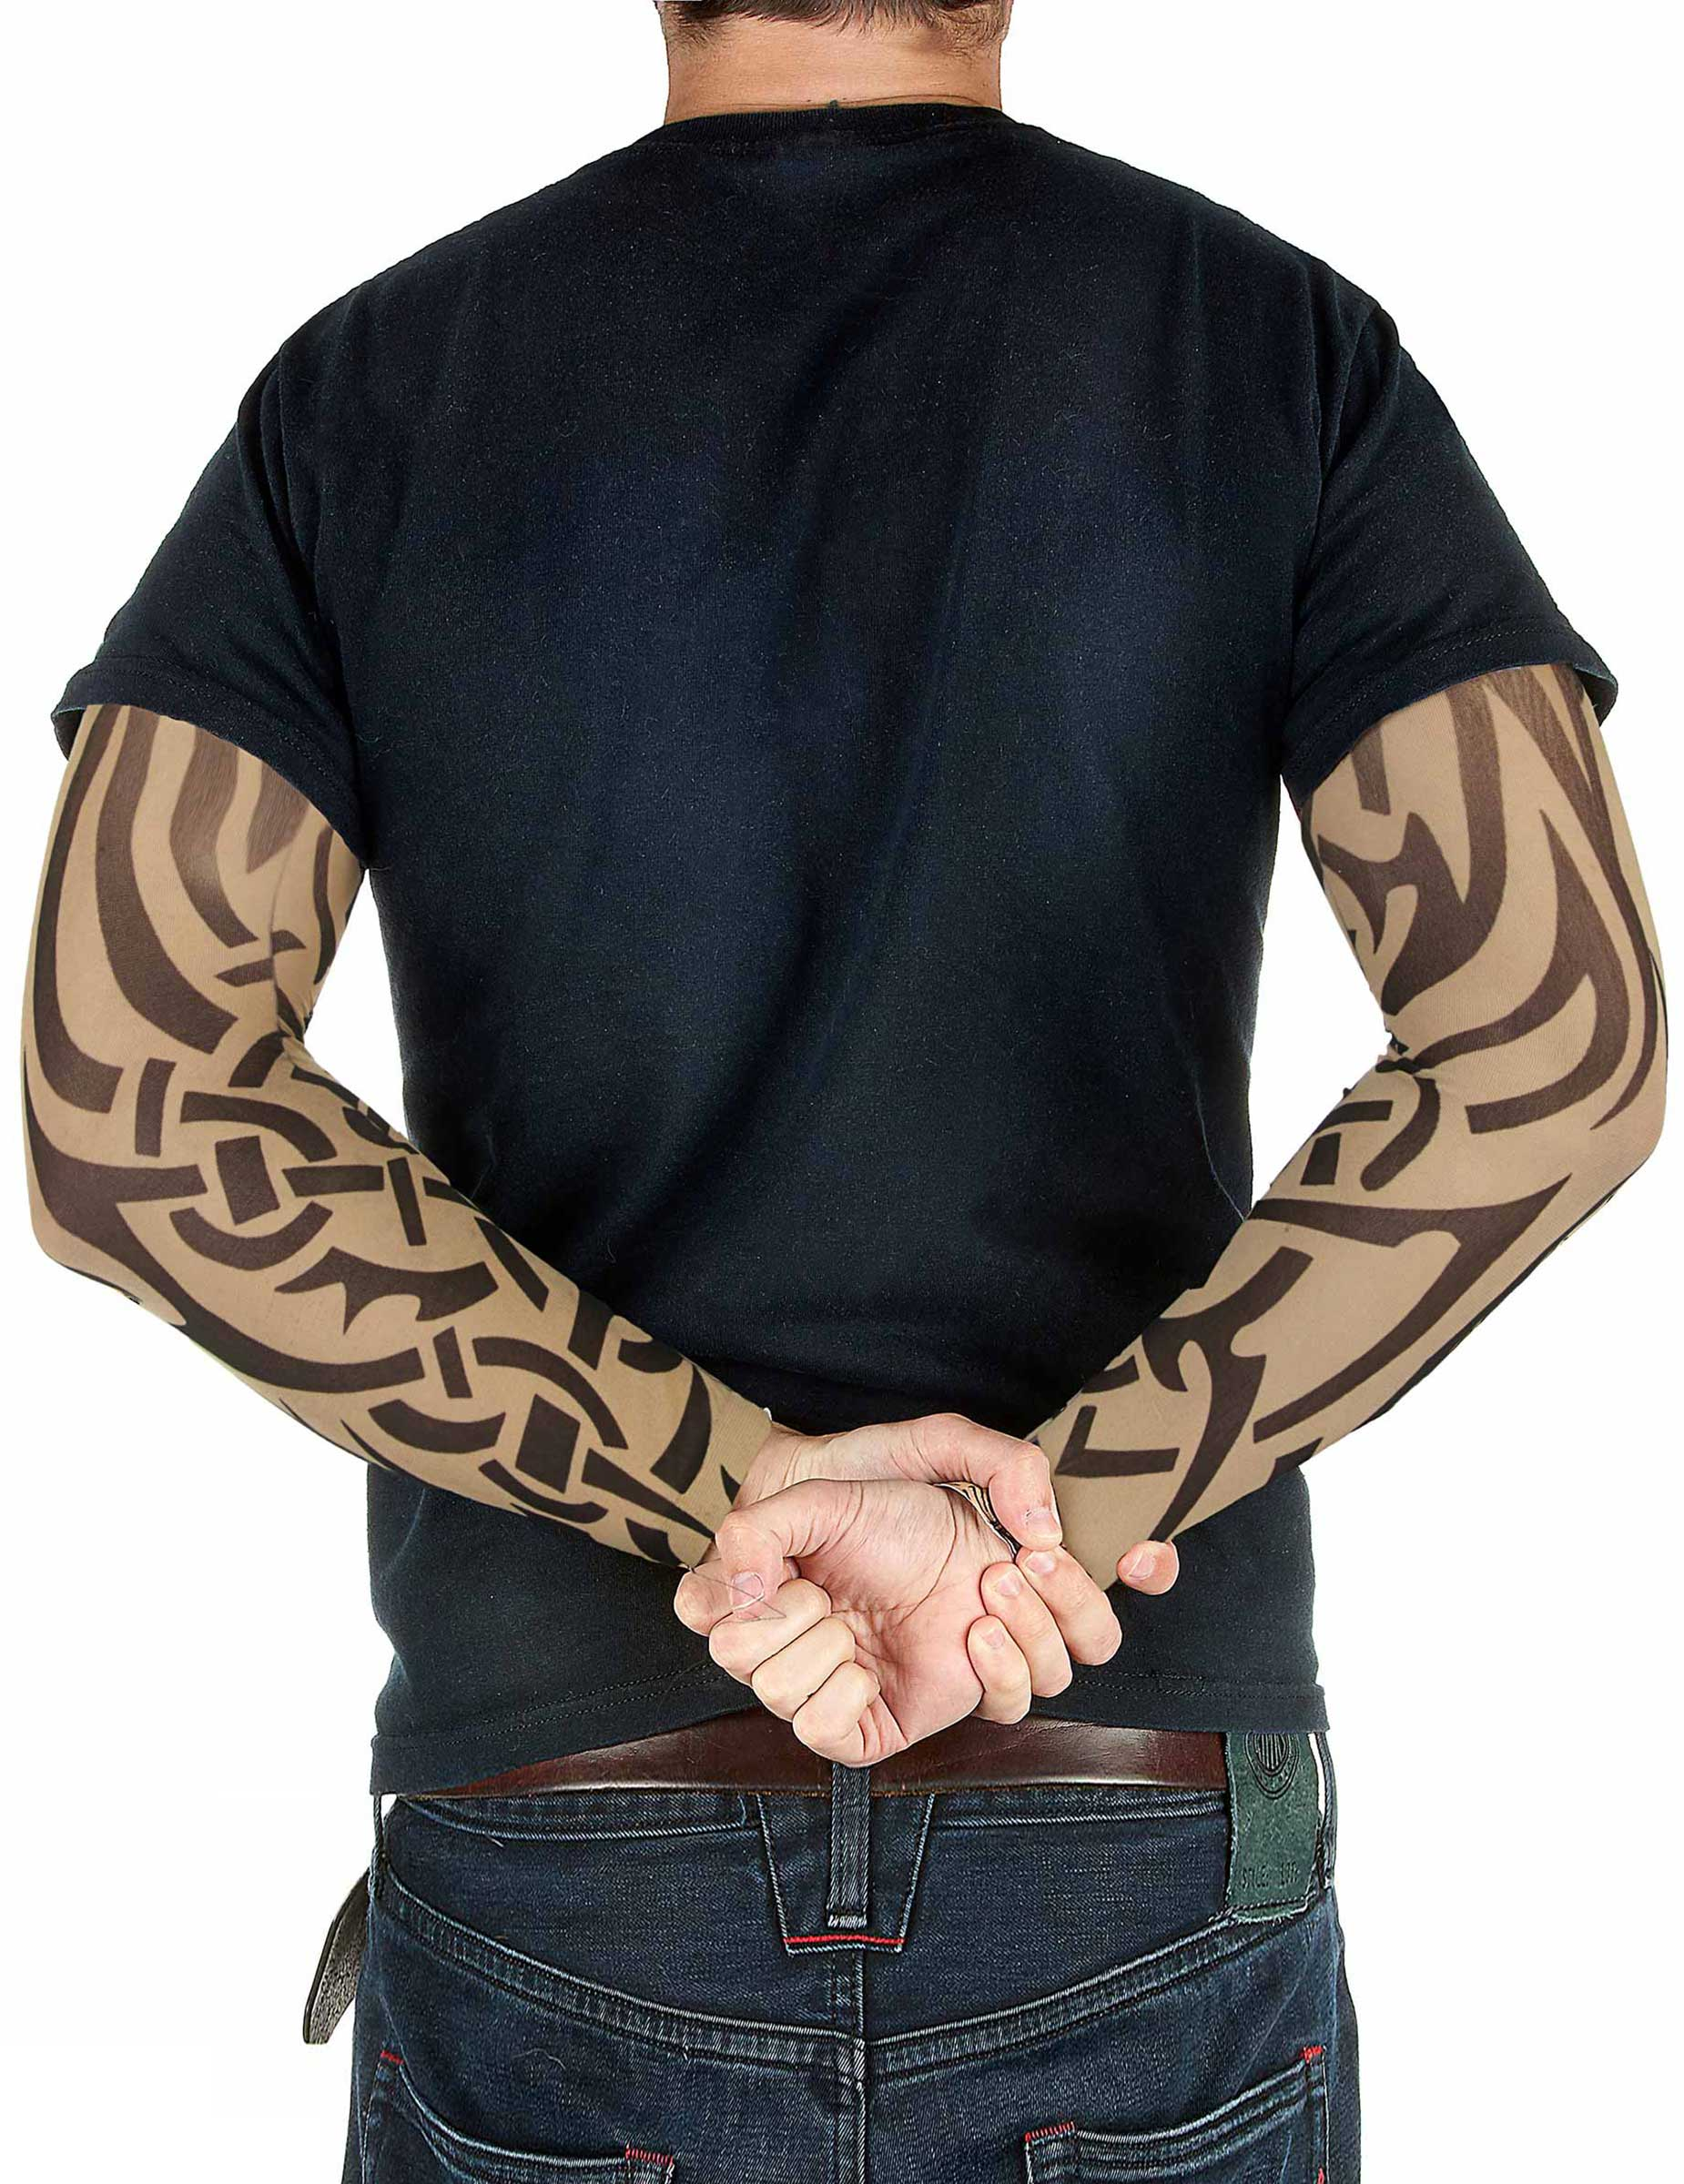 tattoo rmel rocker biker bunt g nstige faschings. Black Bedroom Furniture Sets. Home Design Ideas